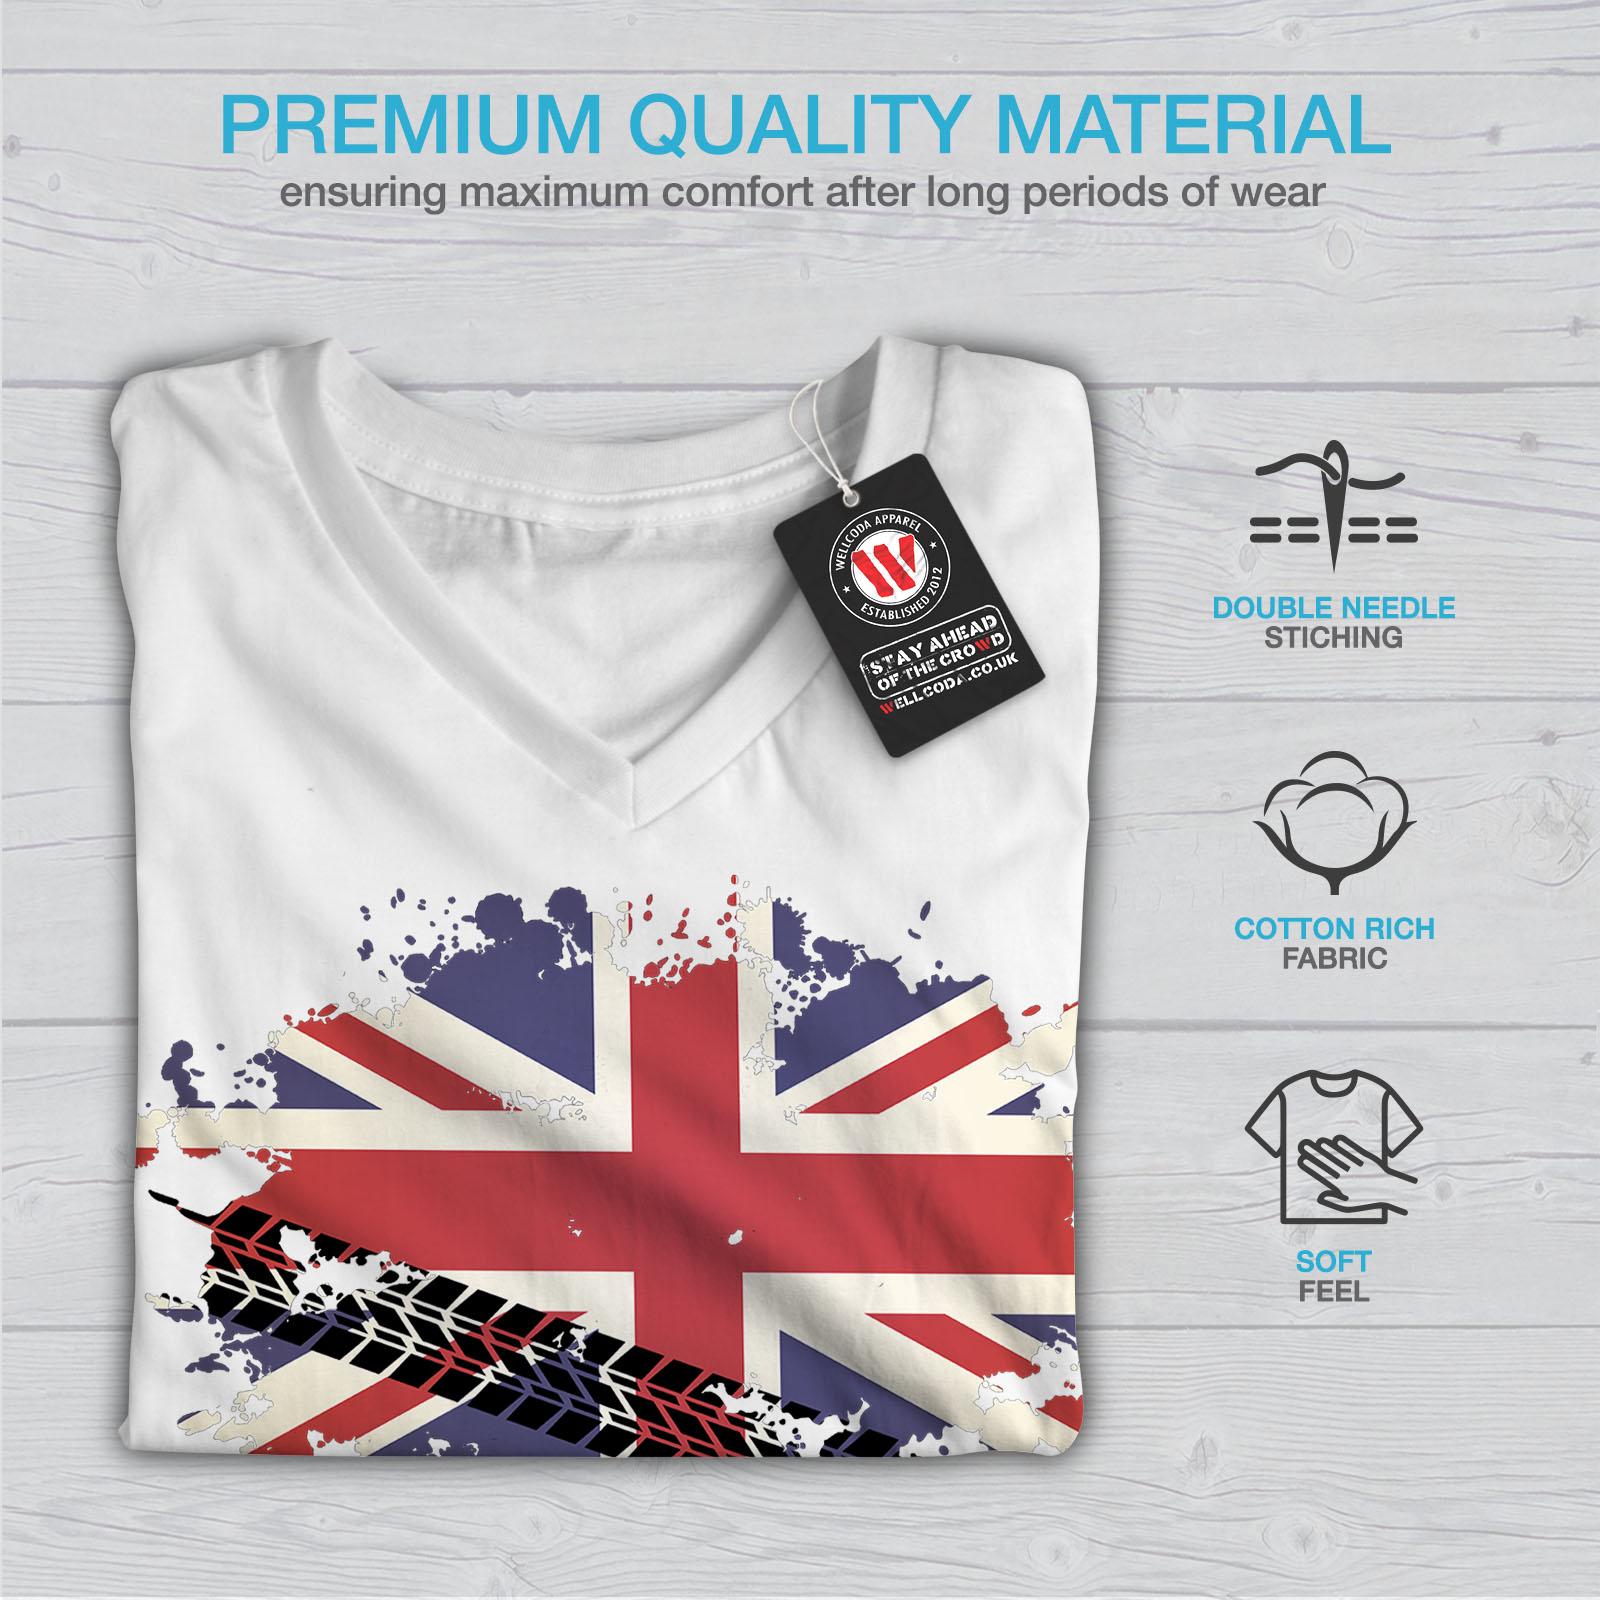 Britain Graphic Design Tee Wellcoda Union Jack Flag Womens V-Neck T-shirt